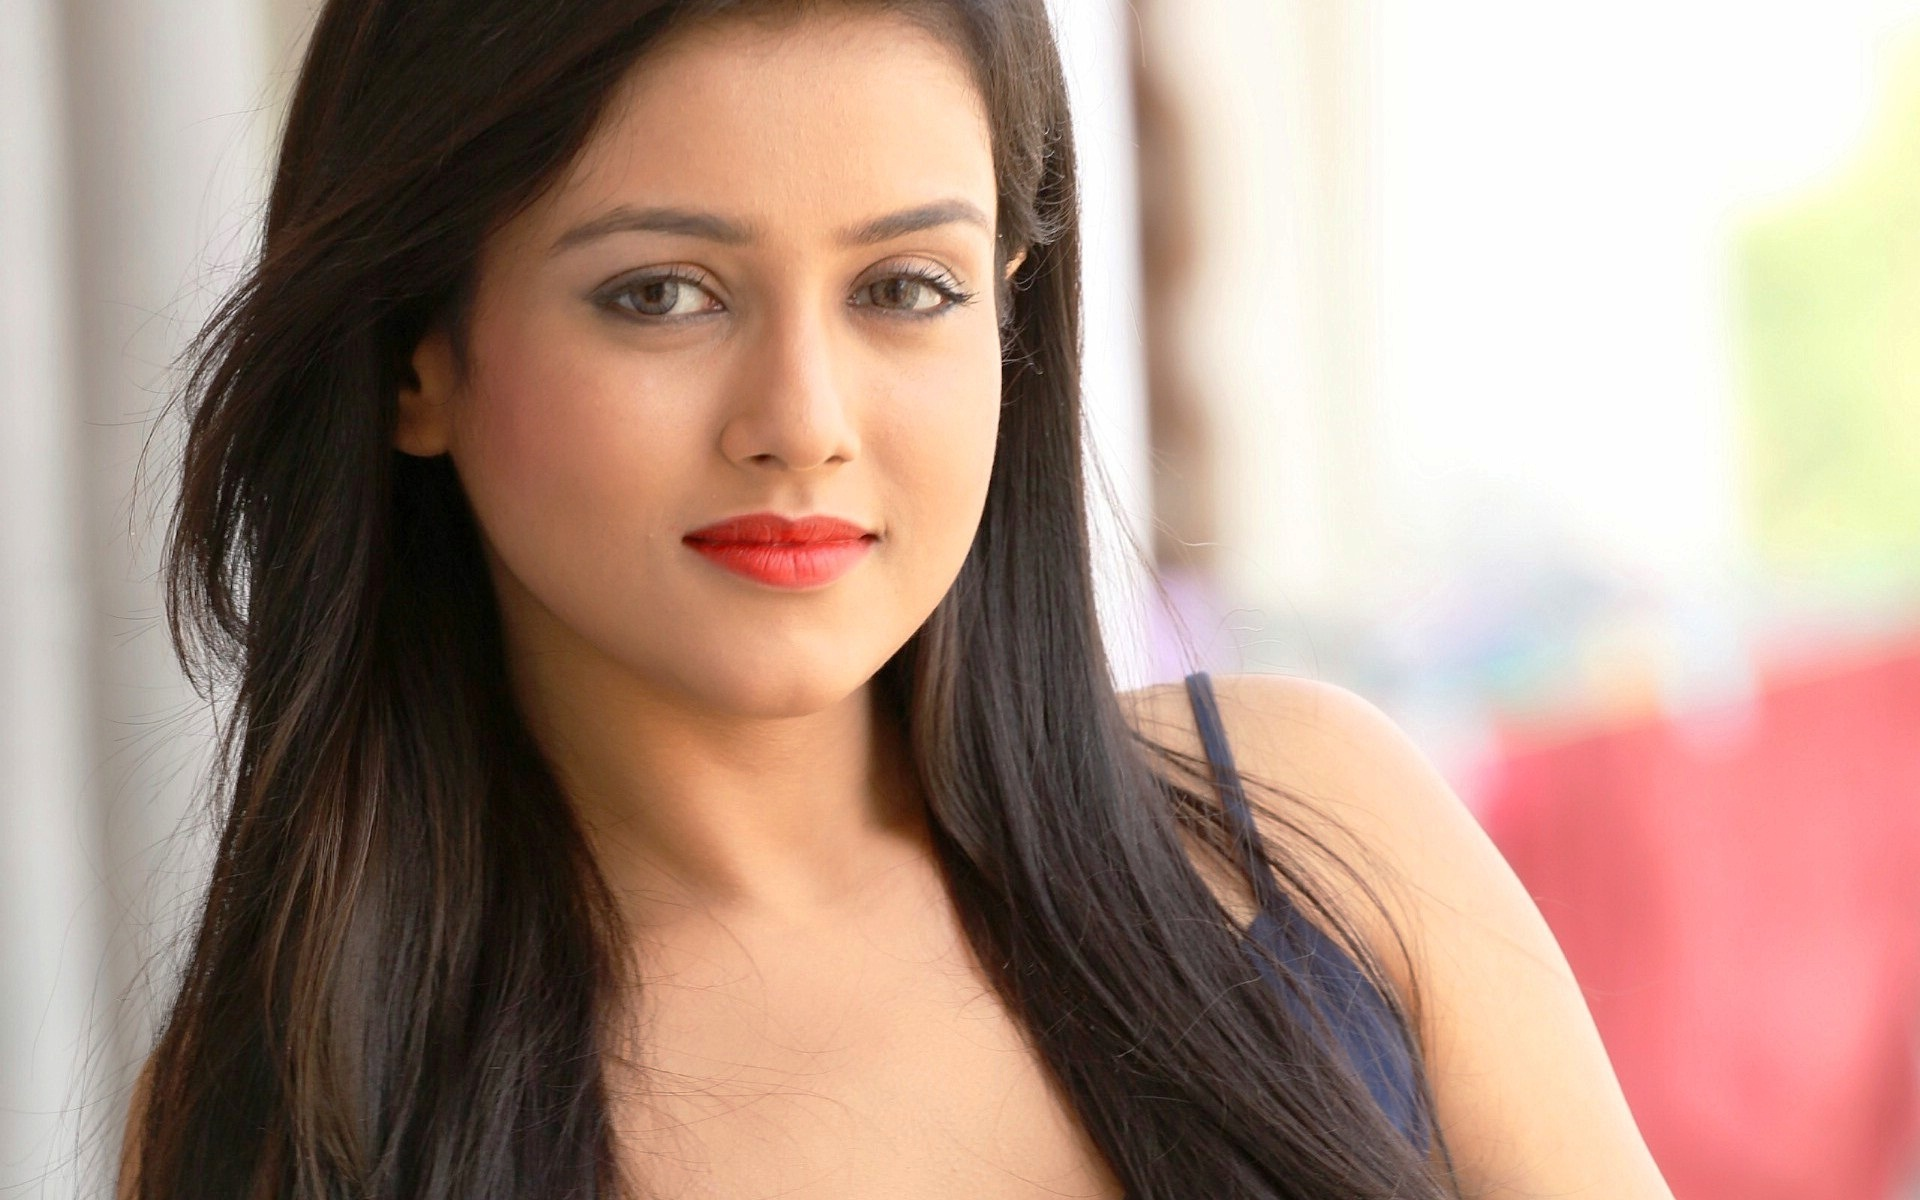 Most Beautiful And Pretty Girl New Wallpapers New Hd - Mishti Chakraborty , HD Wallpaper & Backgrounds